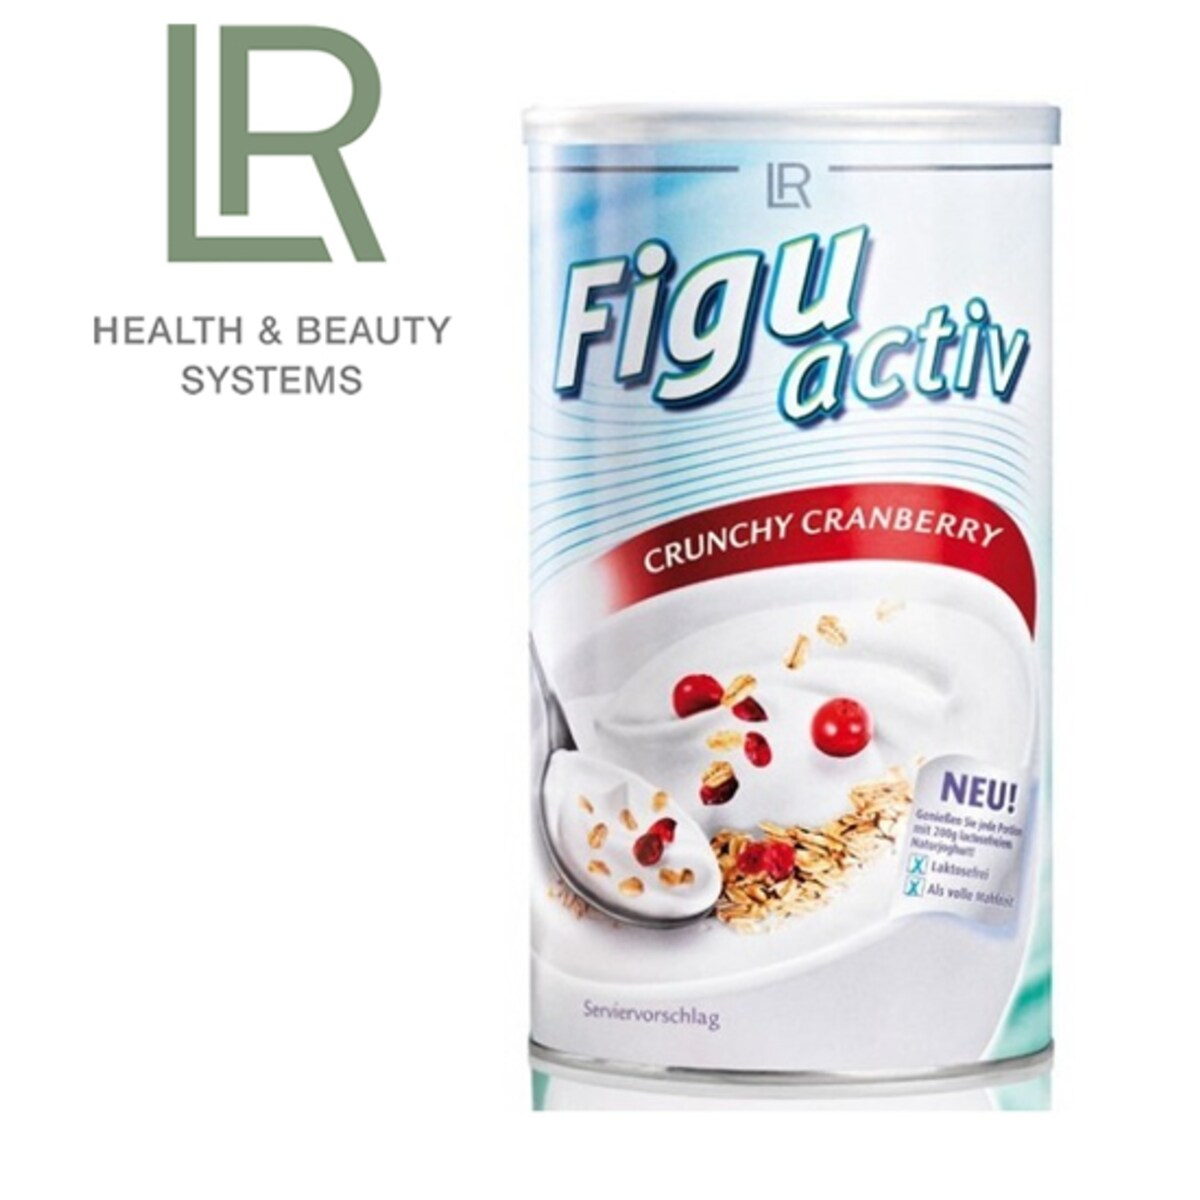 LR Figuactiv Vital Crunchy Cranberry кутия 450 гр